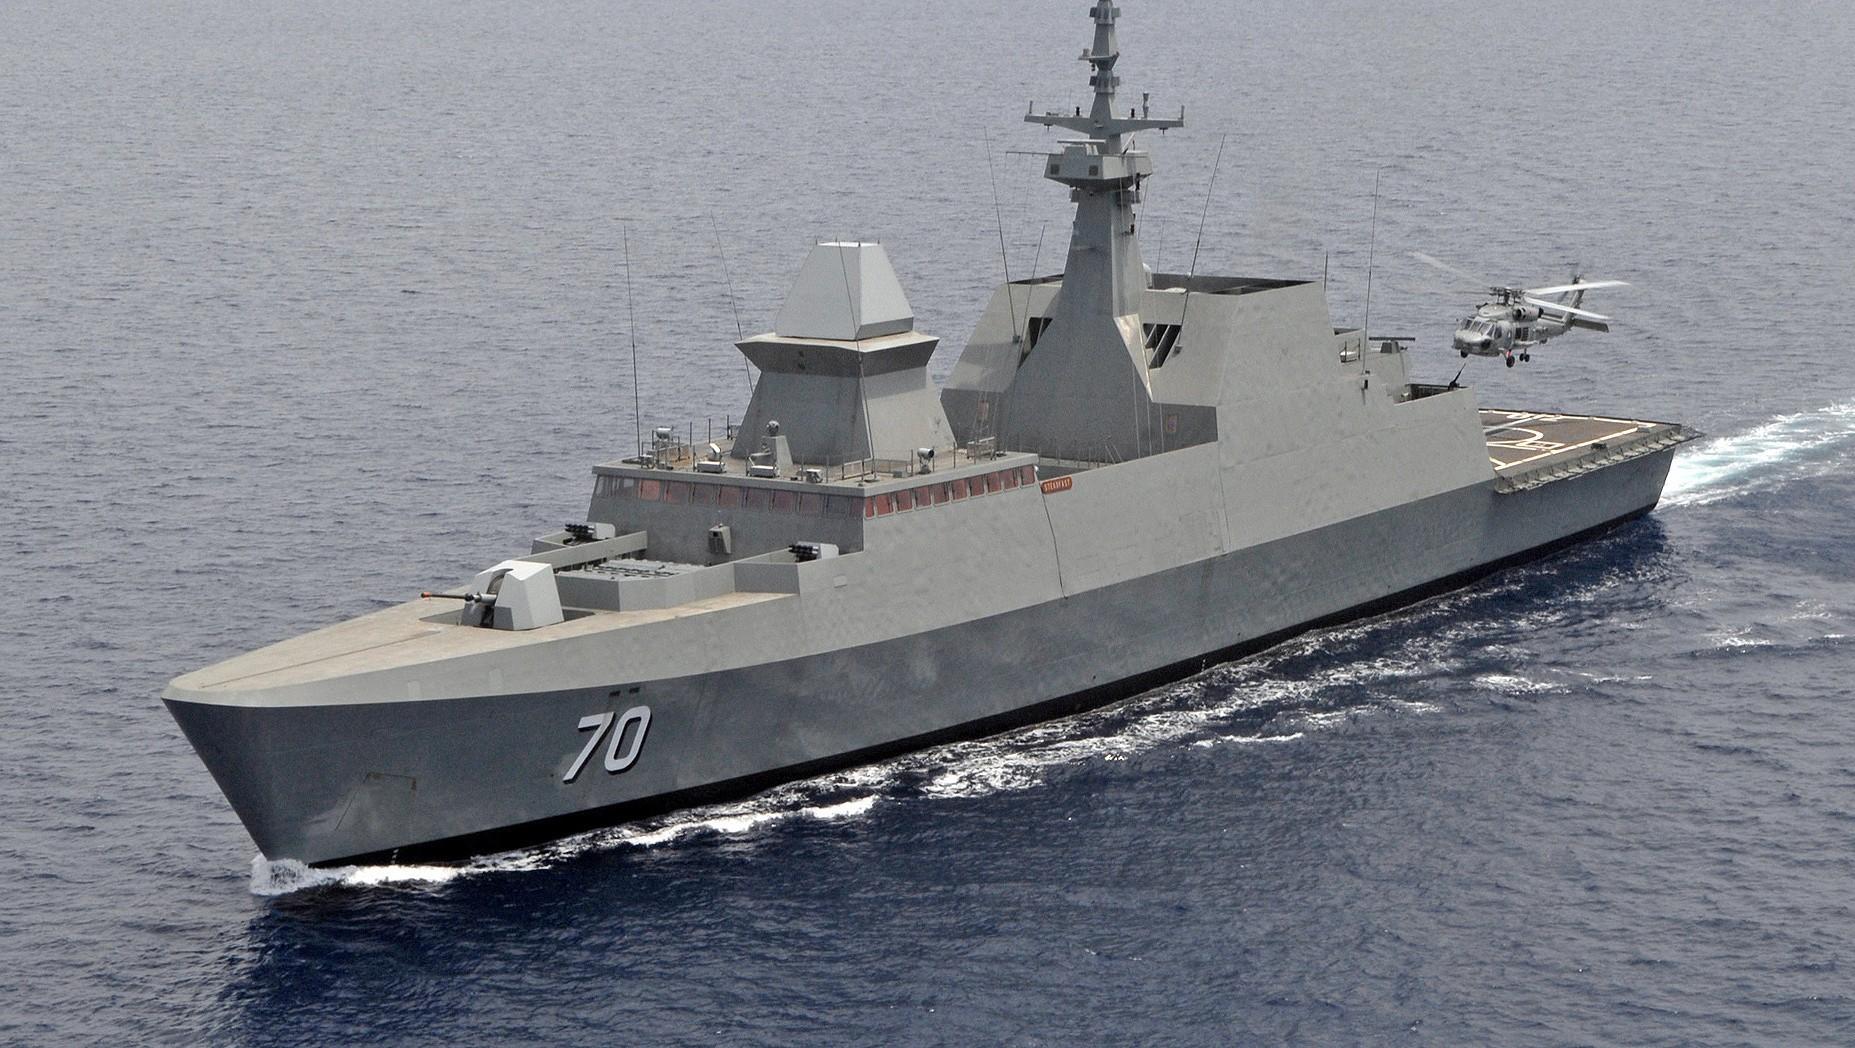 Singapore S Fleet Modernization Slow And Steady